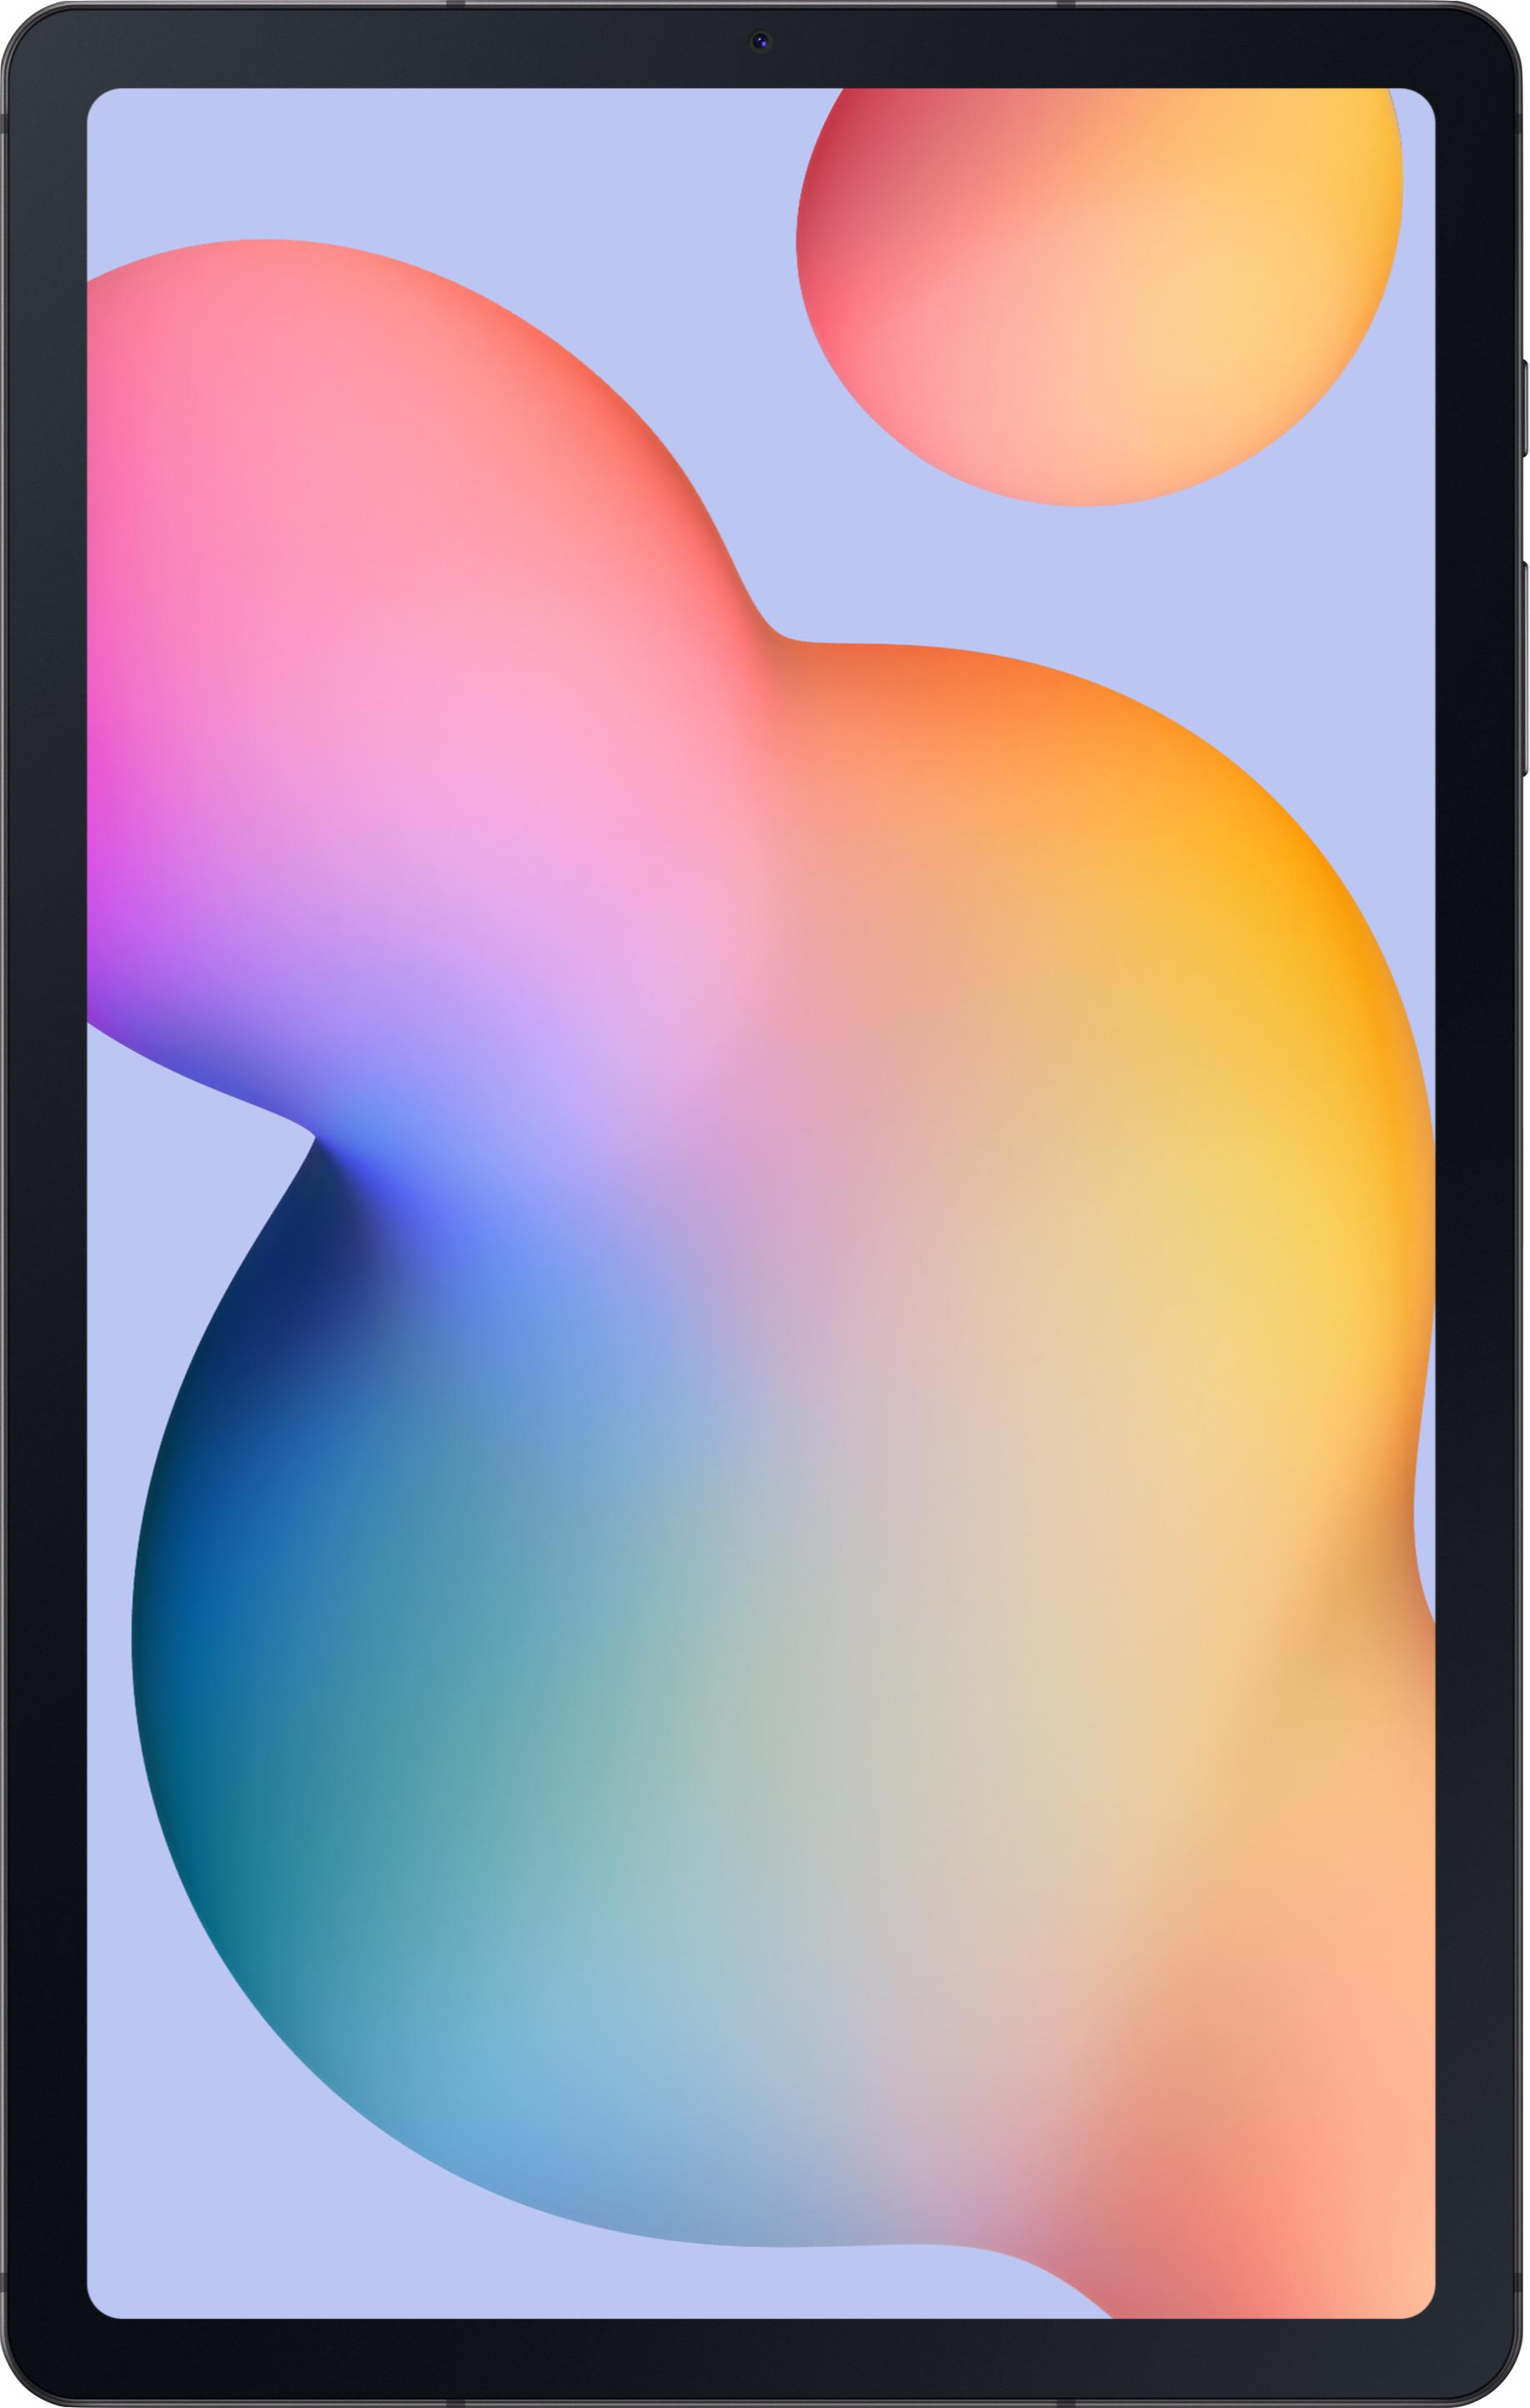 Galaxy Tab S6 image